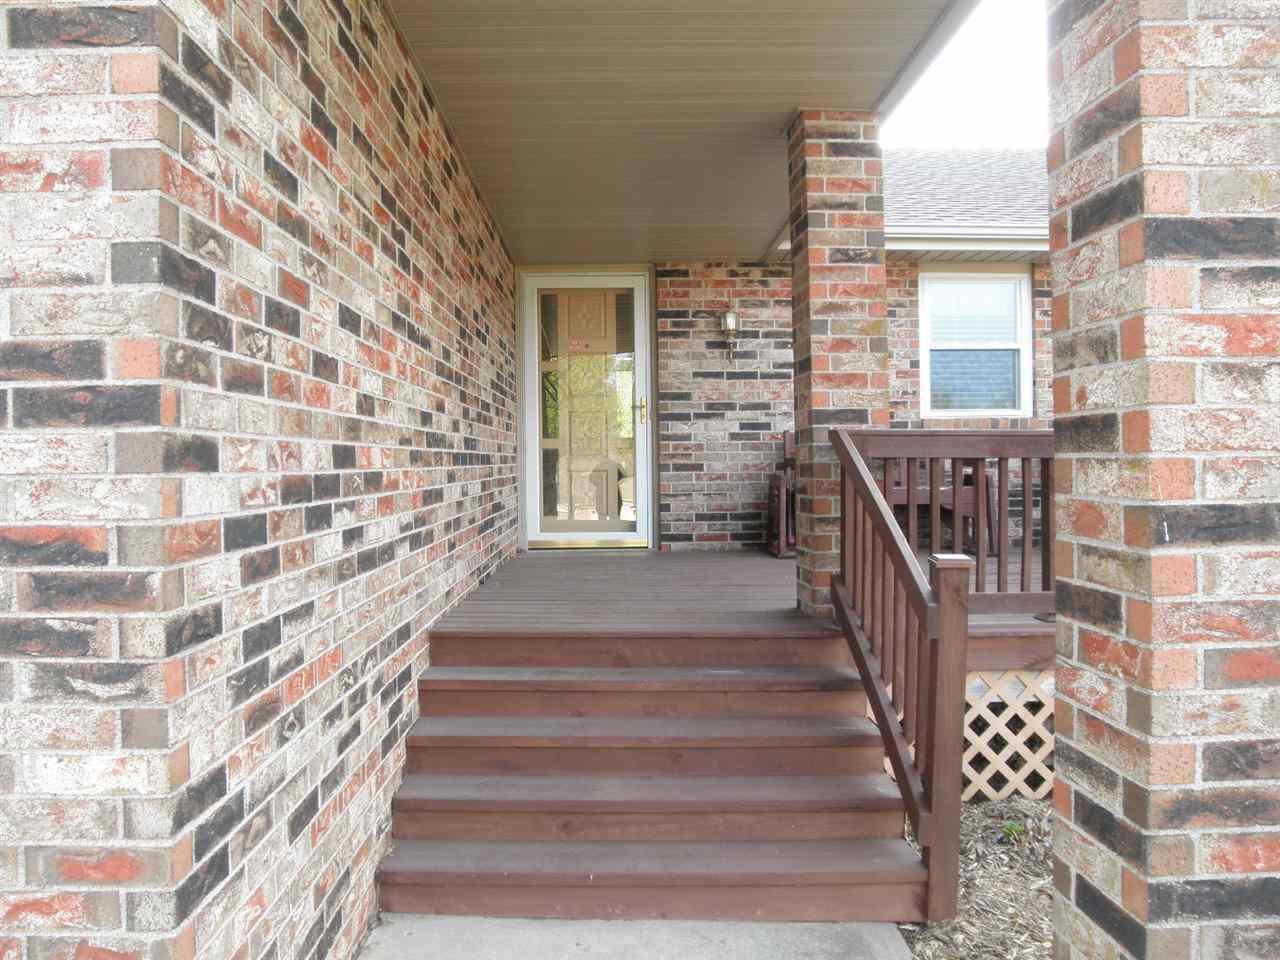 Sold Intraoffice W/MLS | 108 Stardust Lane Ponca City, OK 74604 2